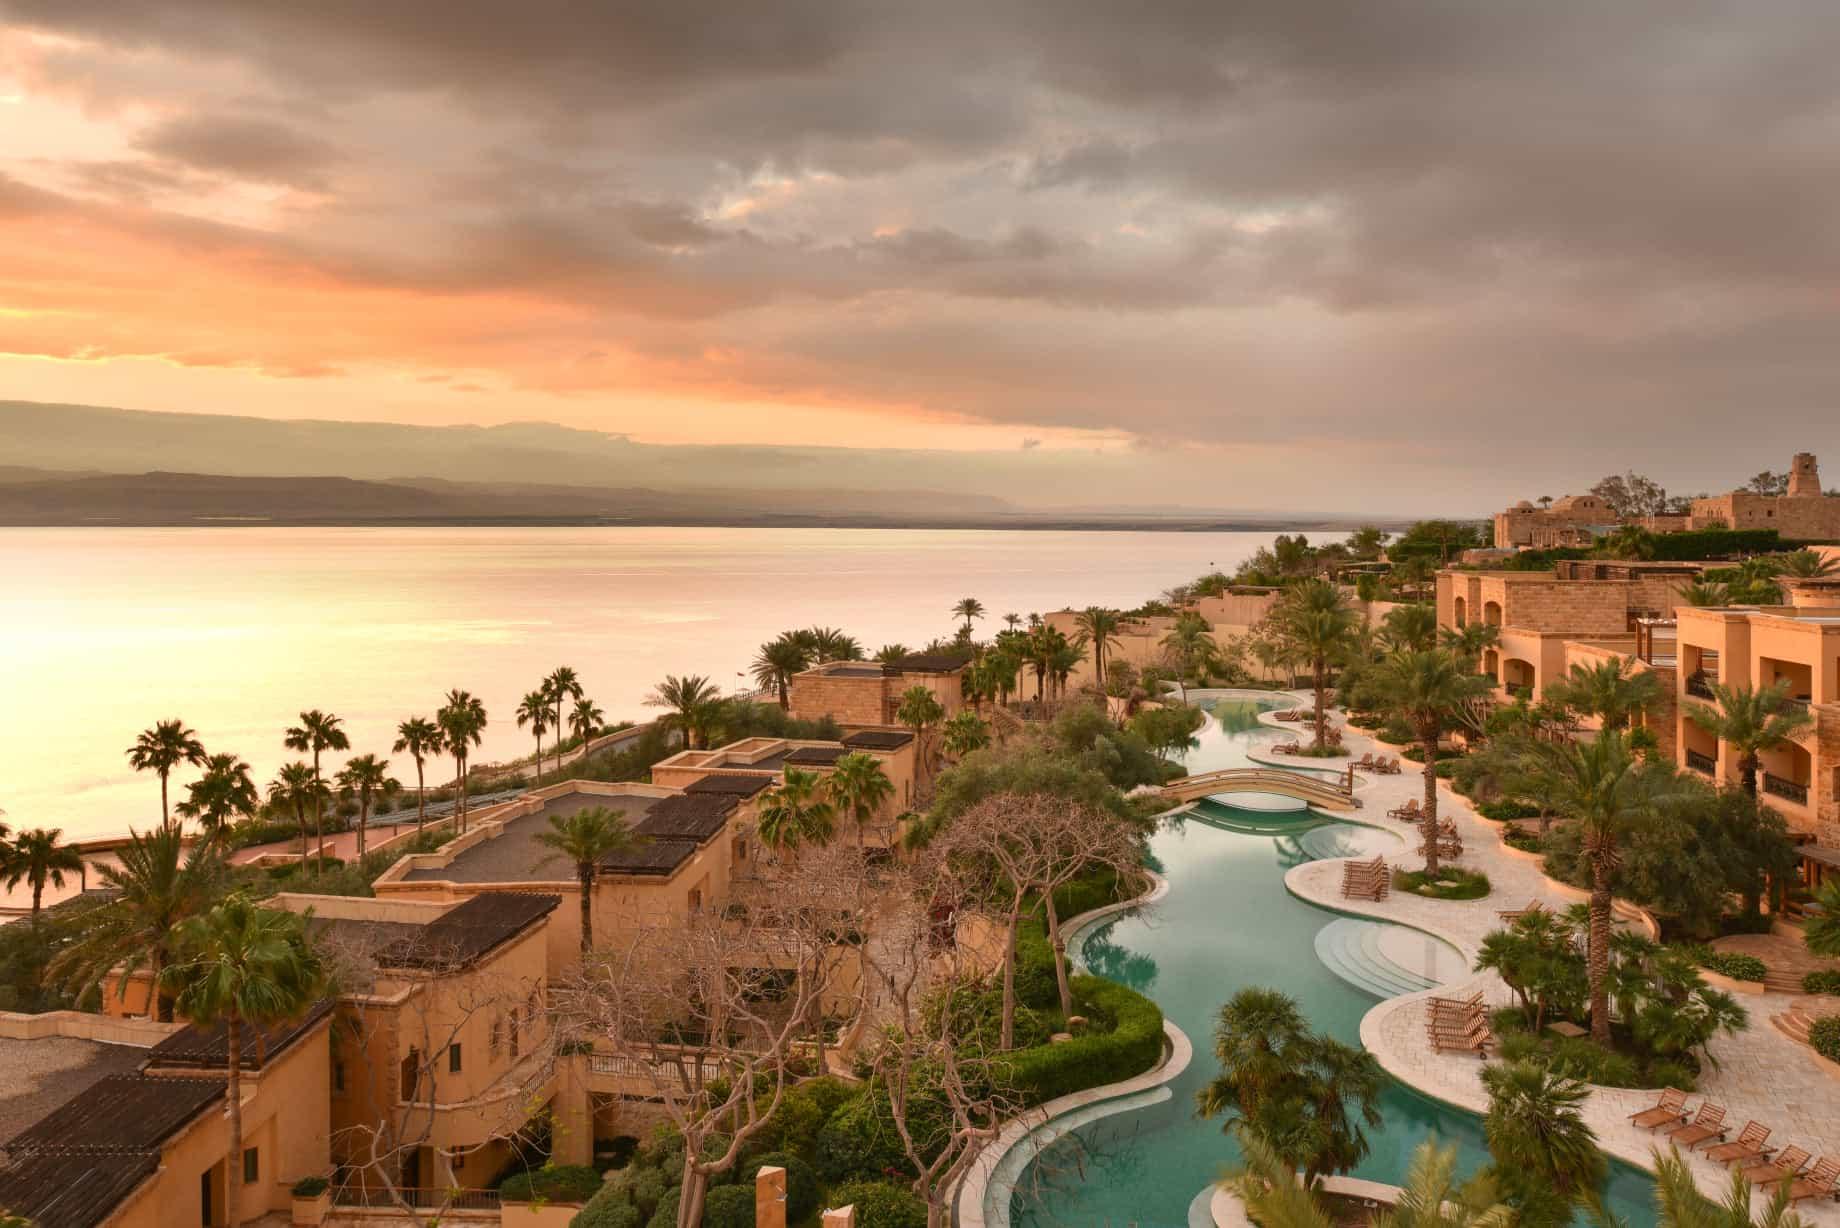 The Kempinski Hotel Ishtar Dead Sea is one of the best 5-star hotels in Jordan.